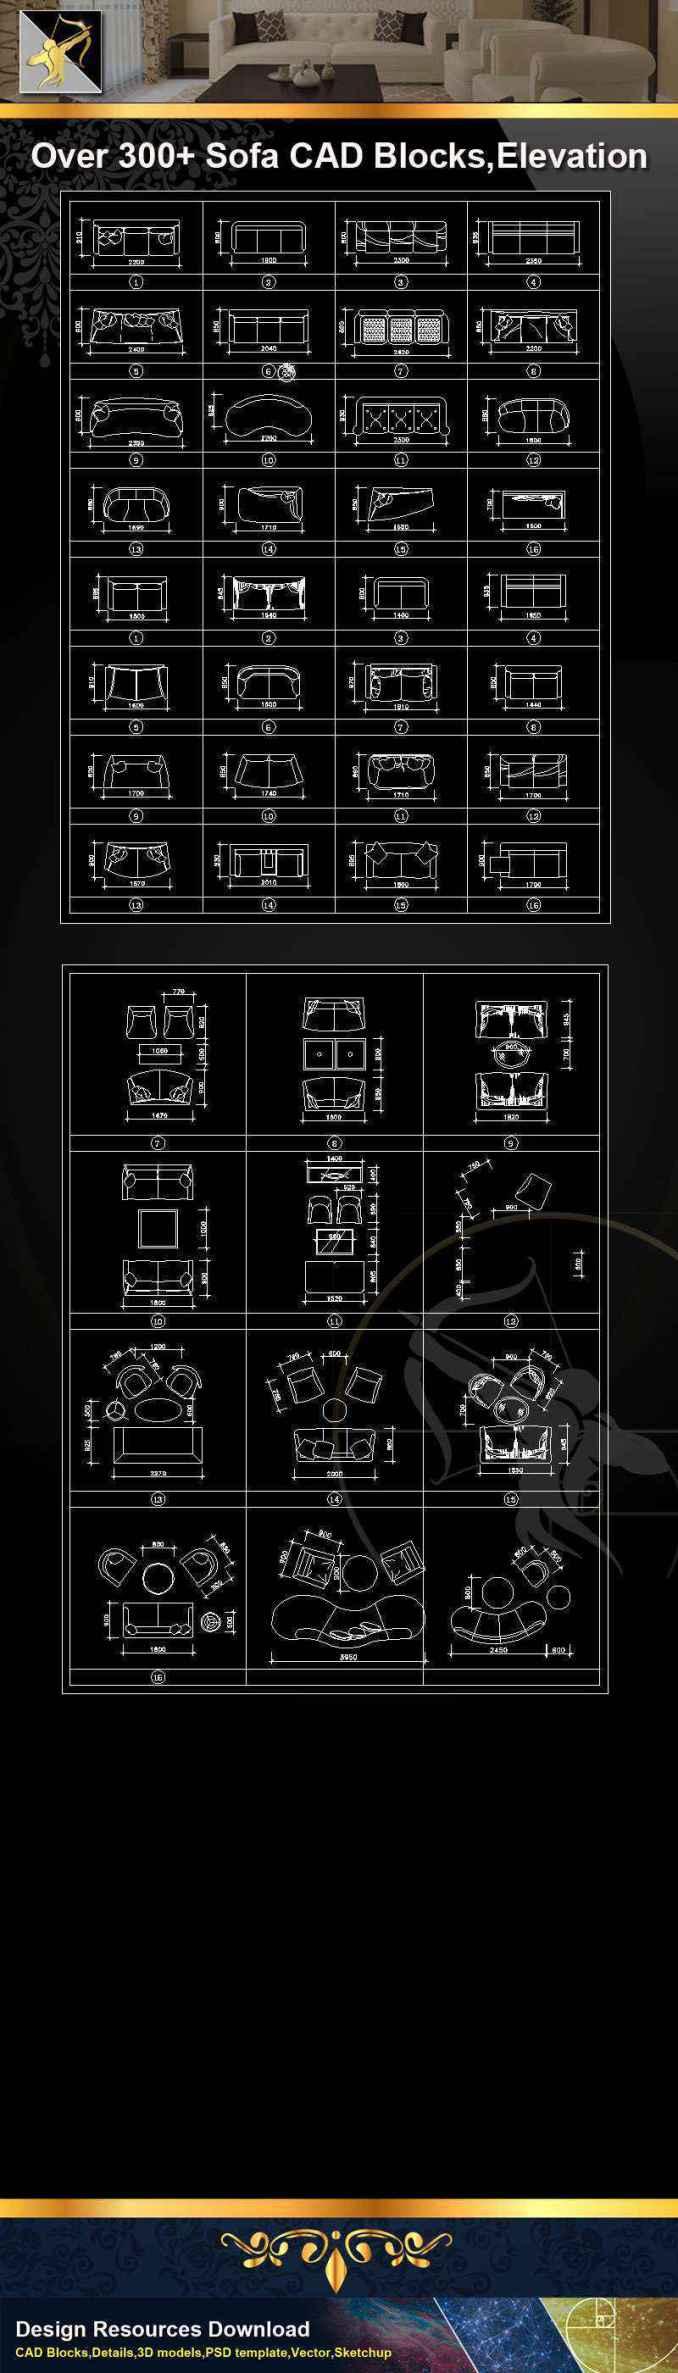 ☆【sofa cad blocks】@autocad blocks drawings cad details elevation